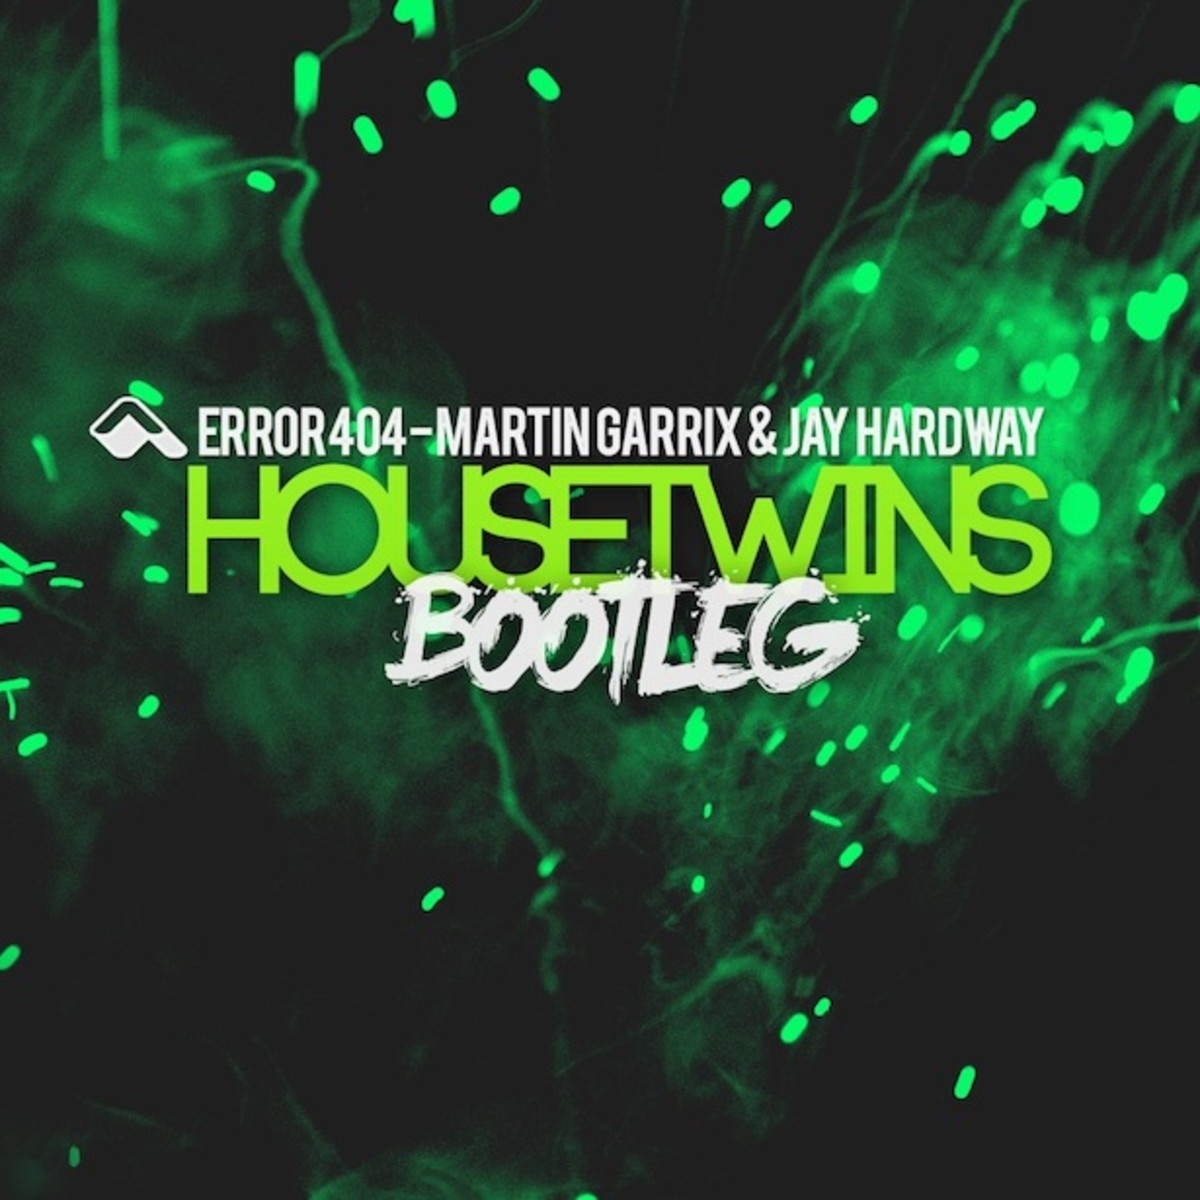 Free Download: Martin Garrix & Jay Hardway - Error 404 (HouseTwins Bootleg)